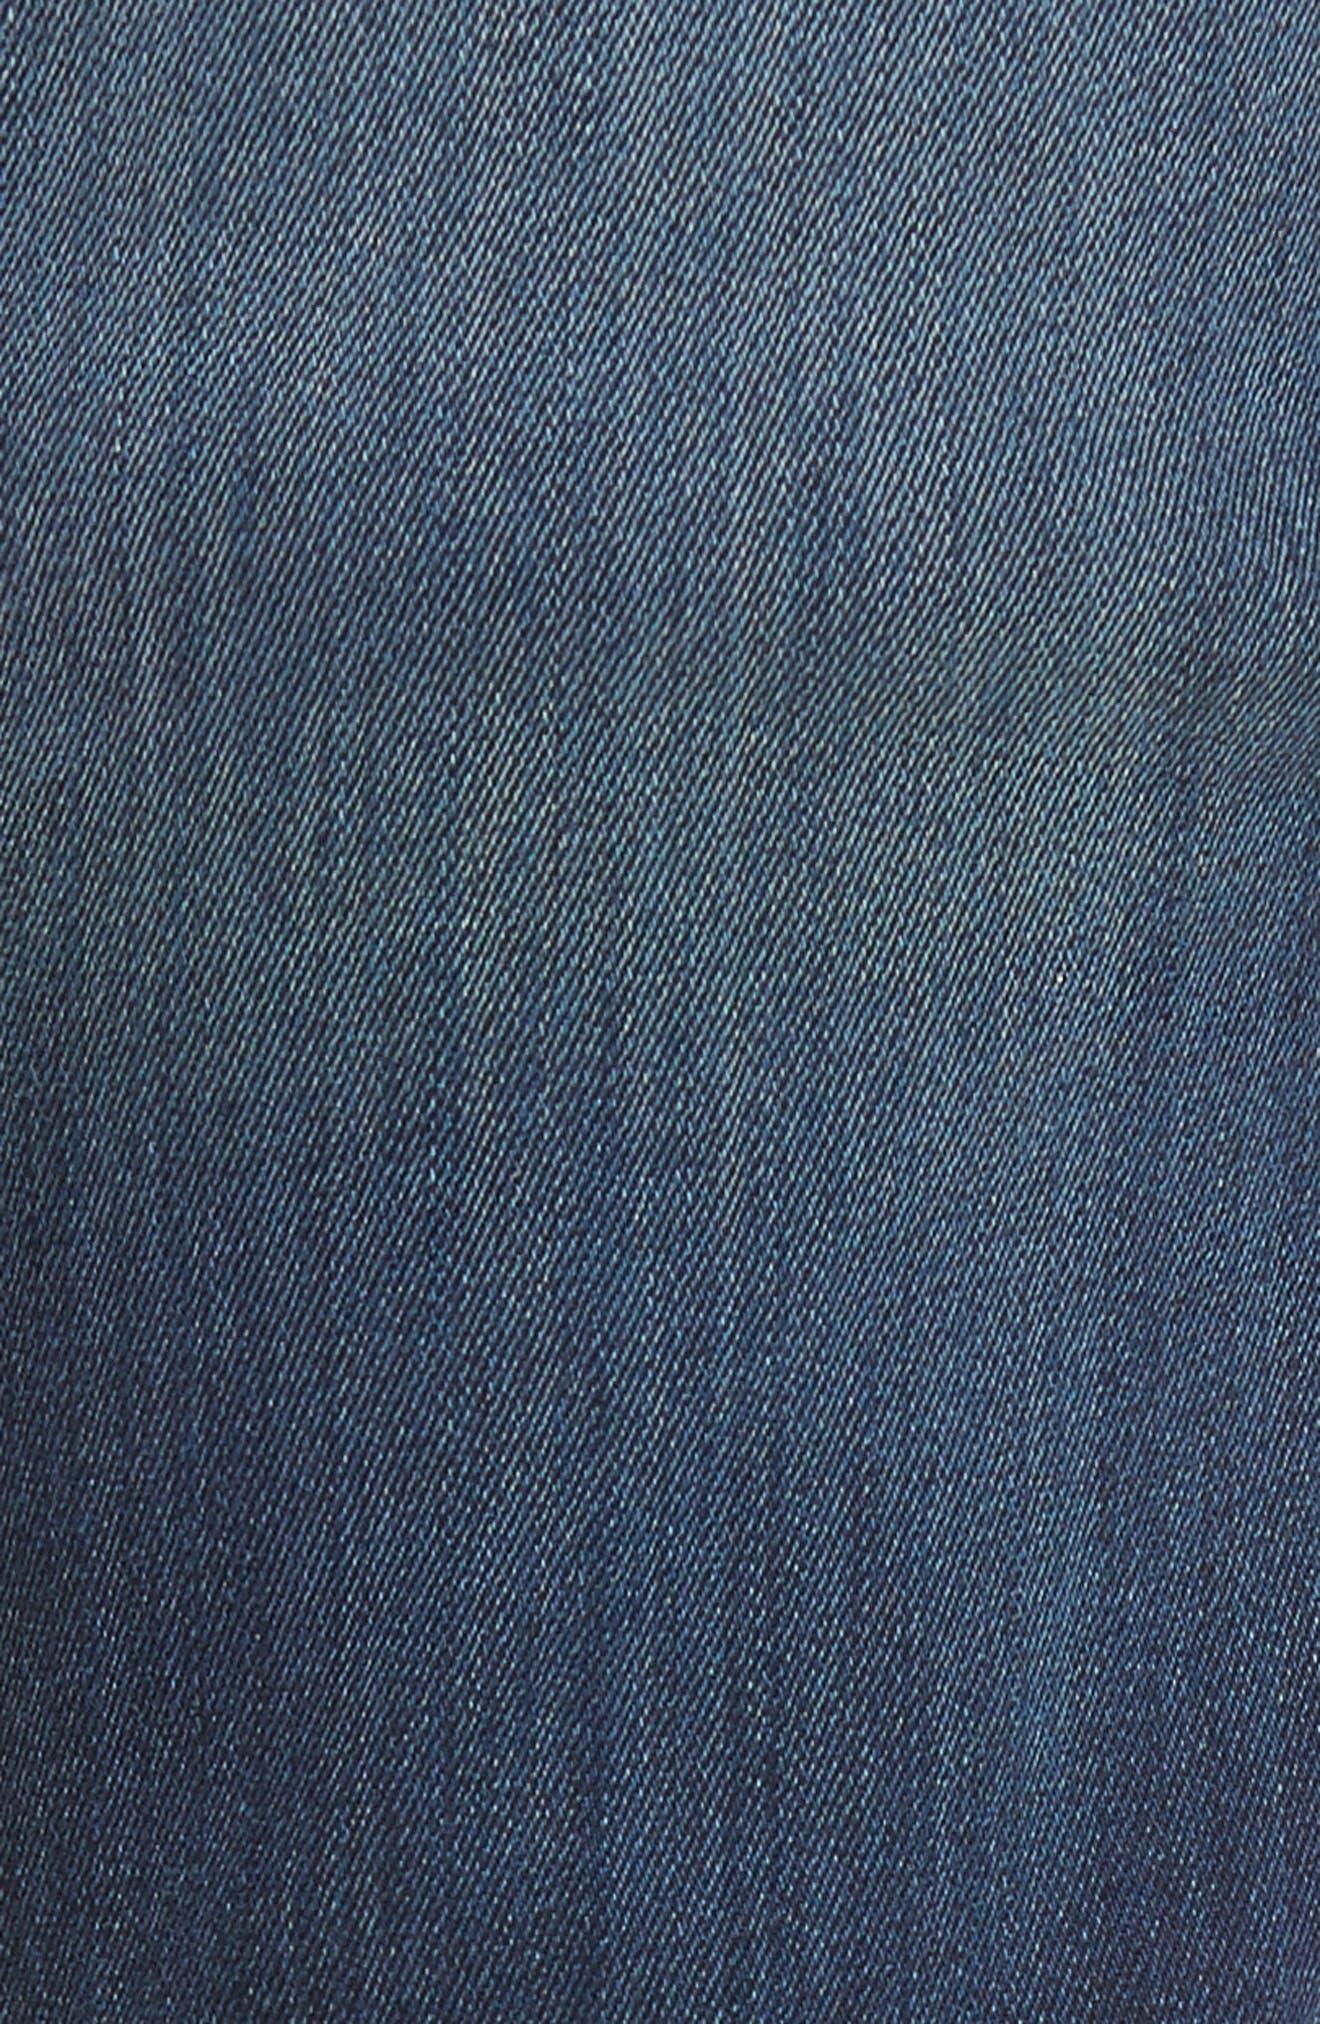 Alternate Image 5  - True Religion Brand Jeans Jack Skinny Fit Jeans (Desert Highway)